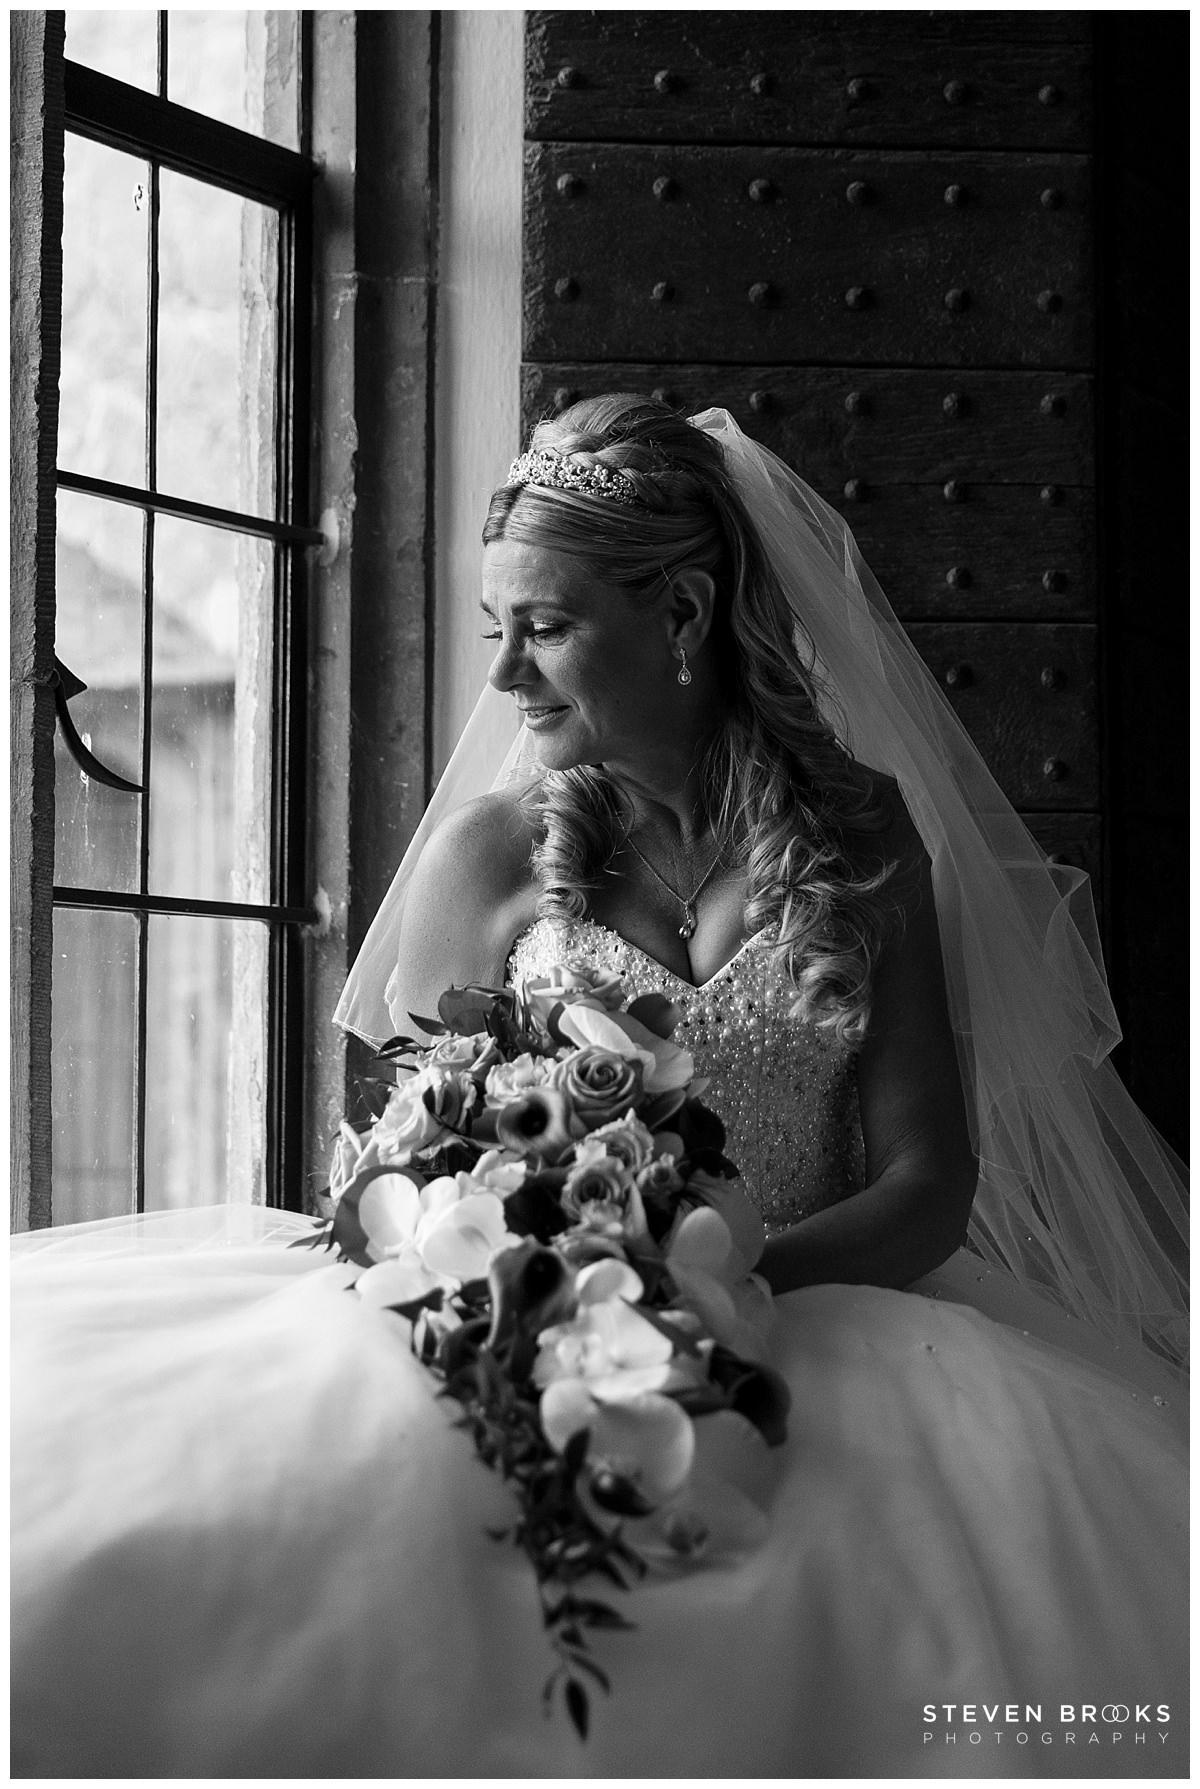 Leeds Castle wedding photographer steven brooks photographs a bridal portrait at Leeds Castle